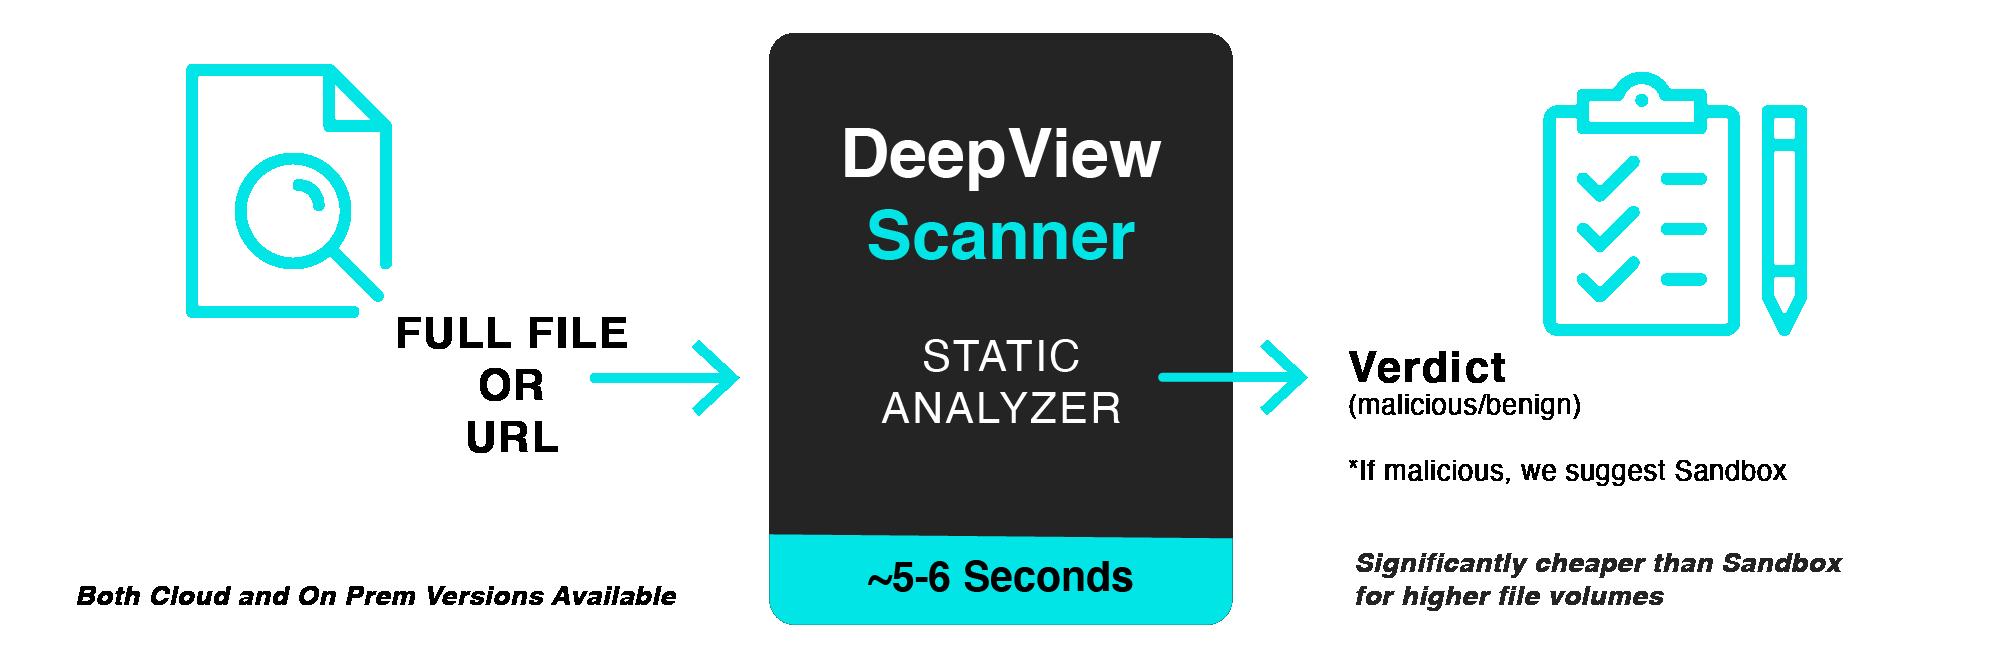 SecondWrite DeepView Scanner Workflow